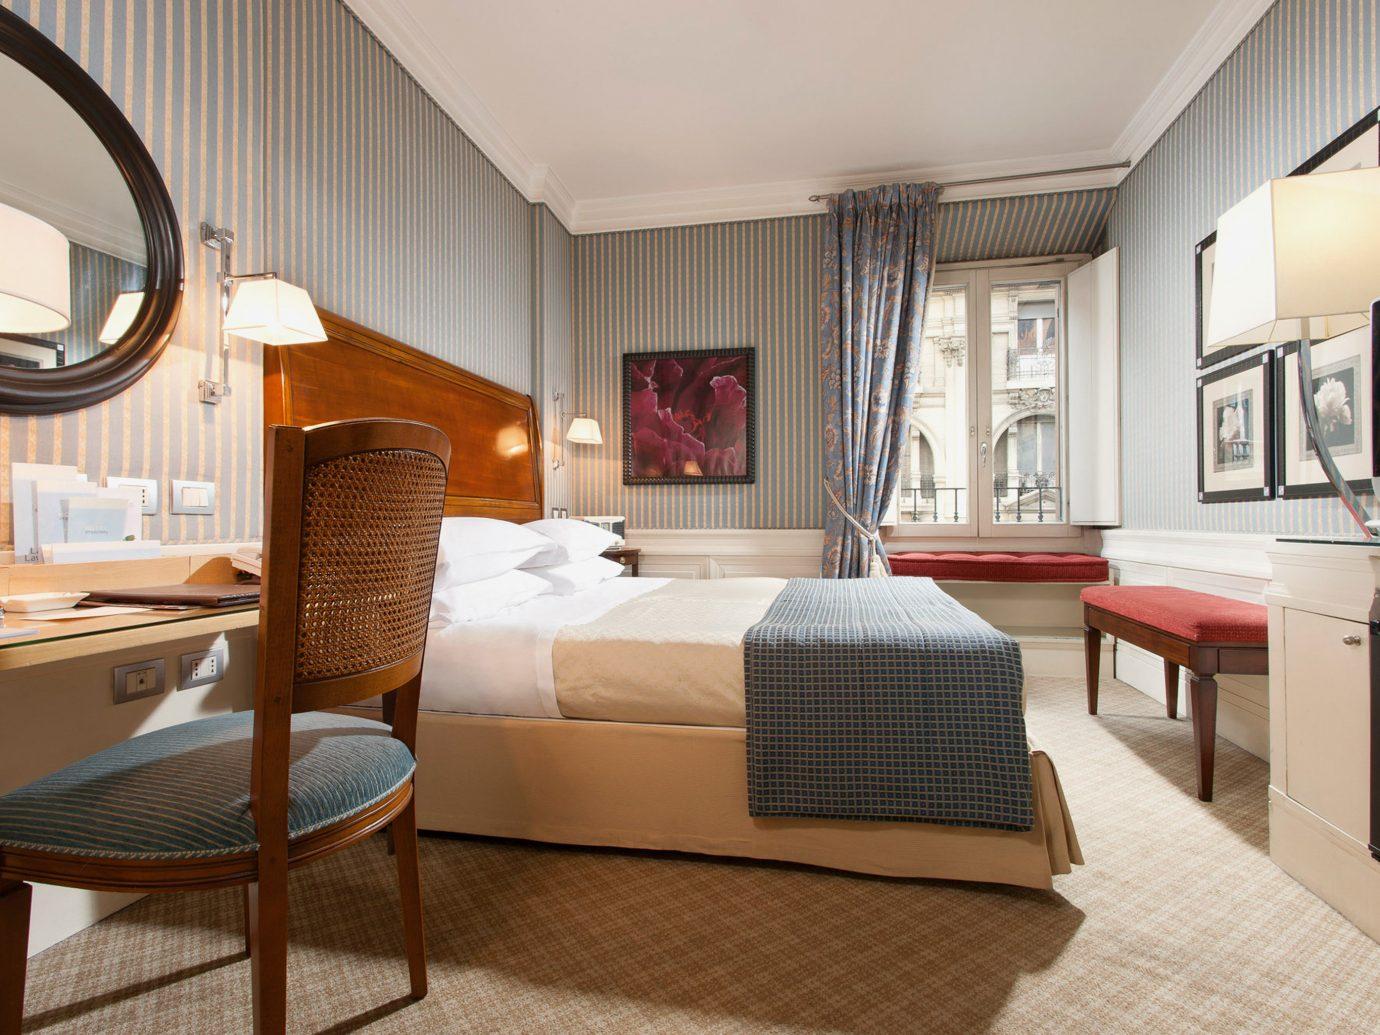 Hotel Stendhal, Rome